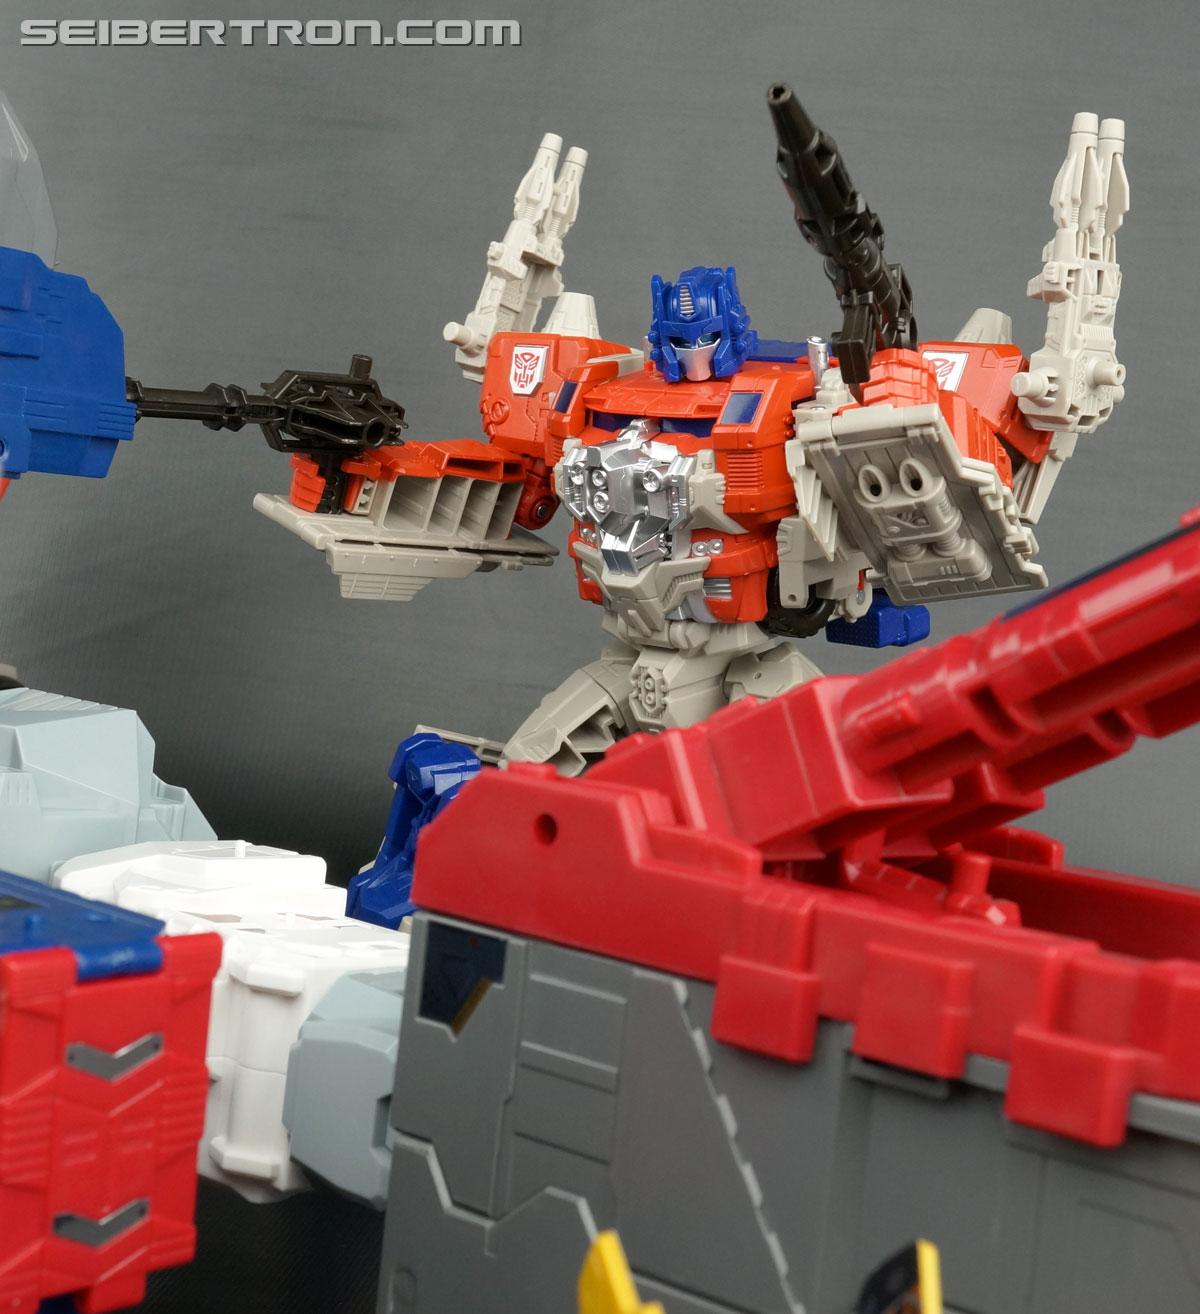 Transformers Titans Return Fortress Maximus (Image #149 of 399)